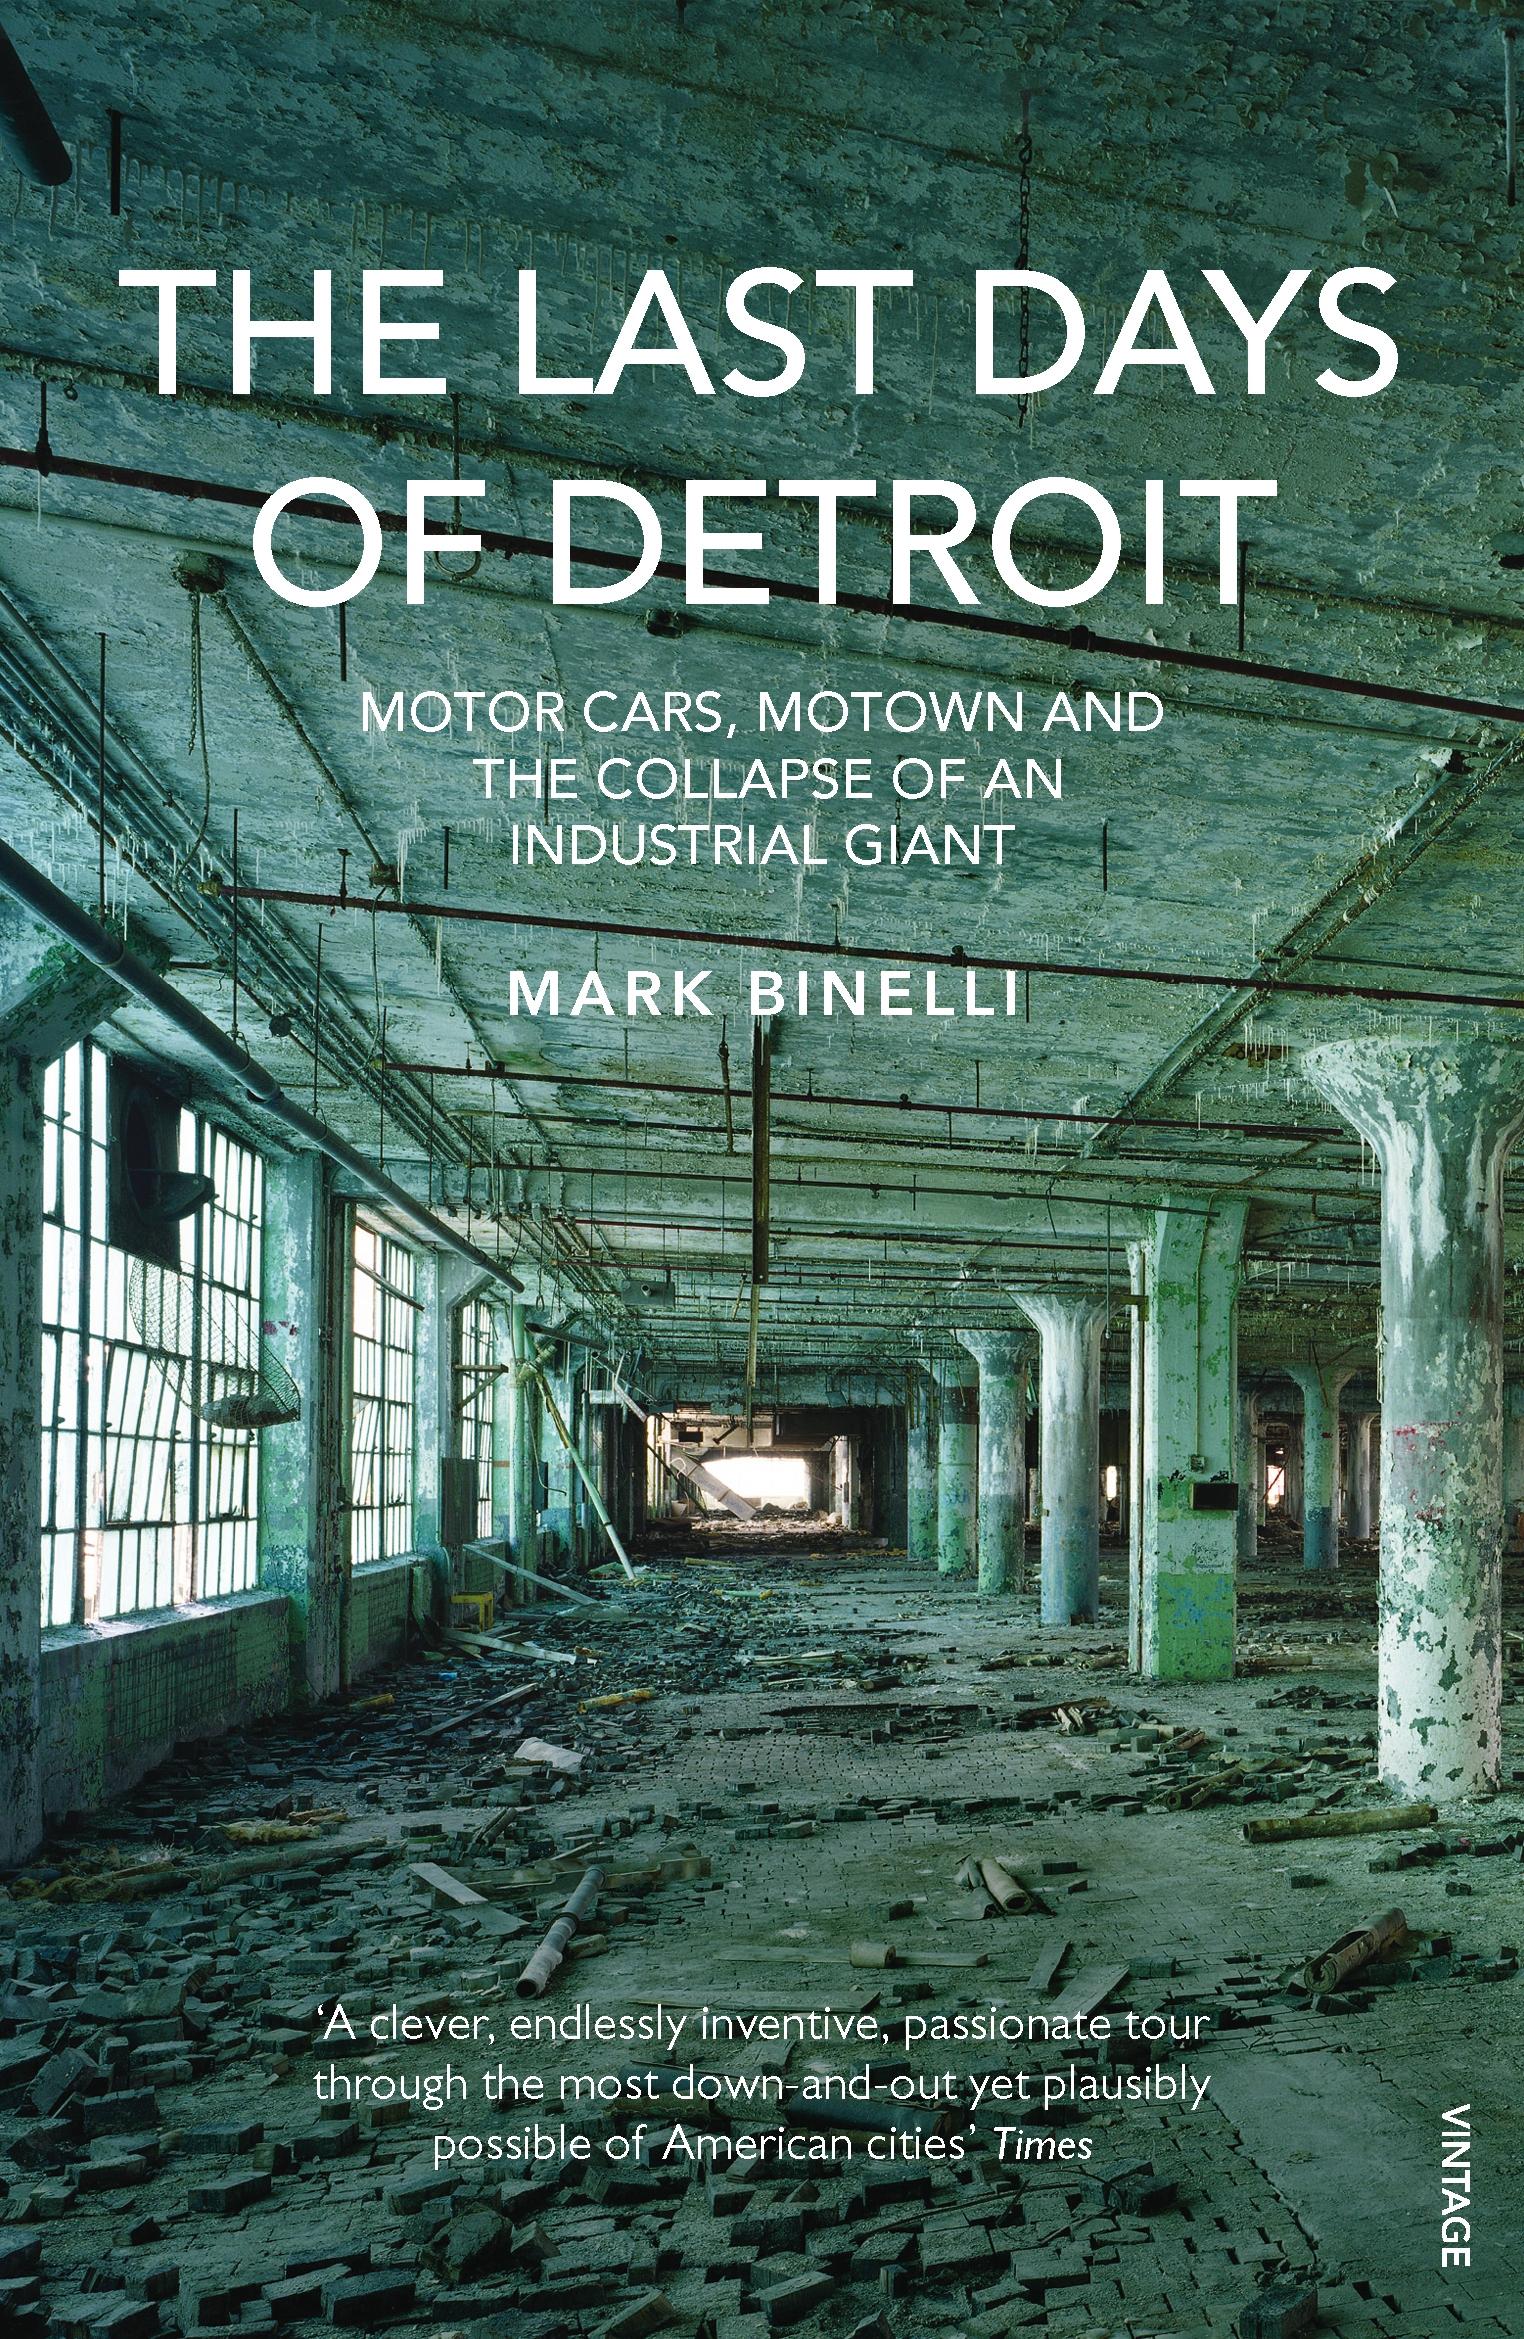 The Last Days Of Detroit By Mark Binelli Penguin Books border=